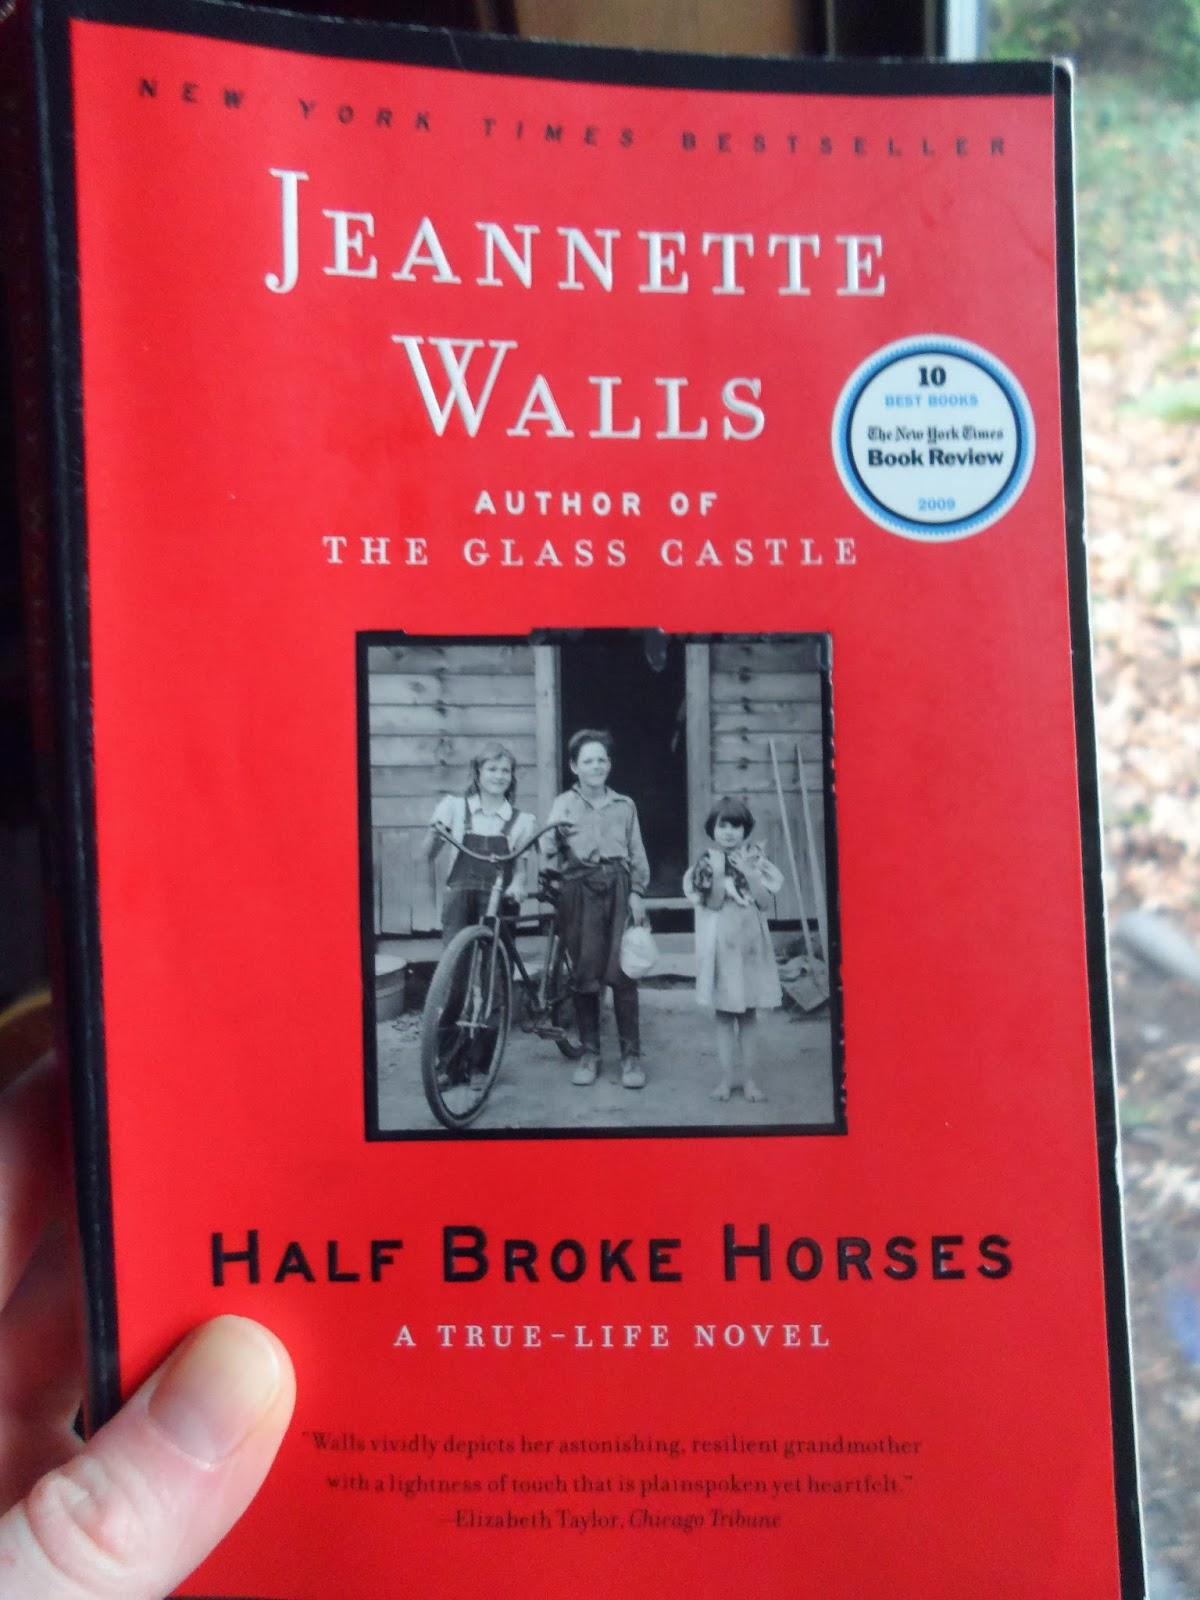 jeannette walls writing style